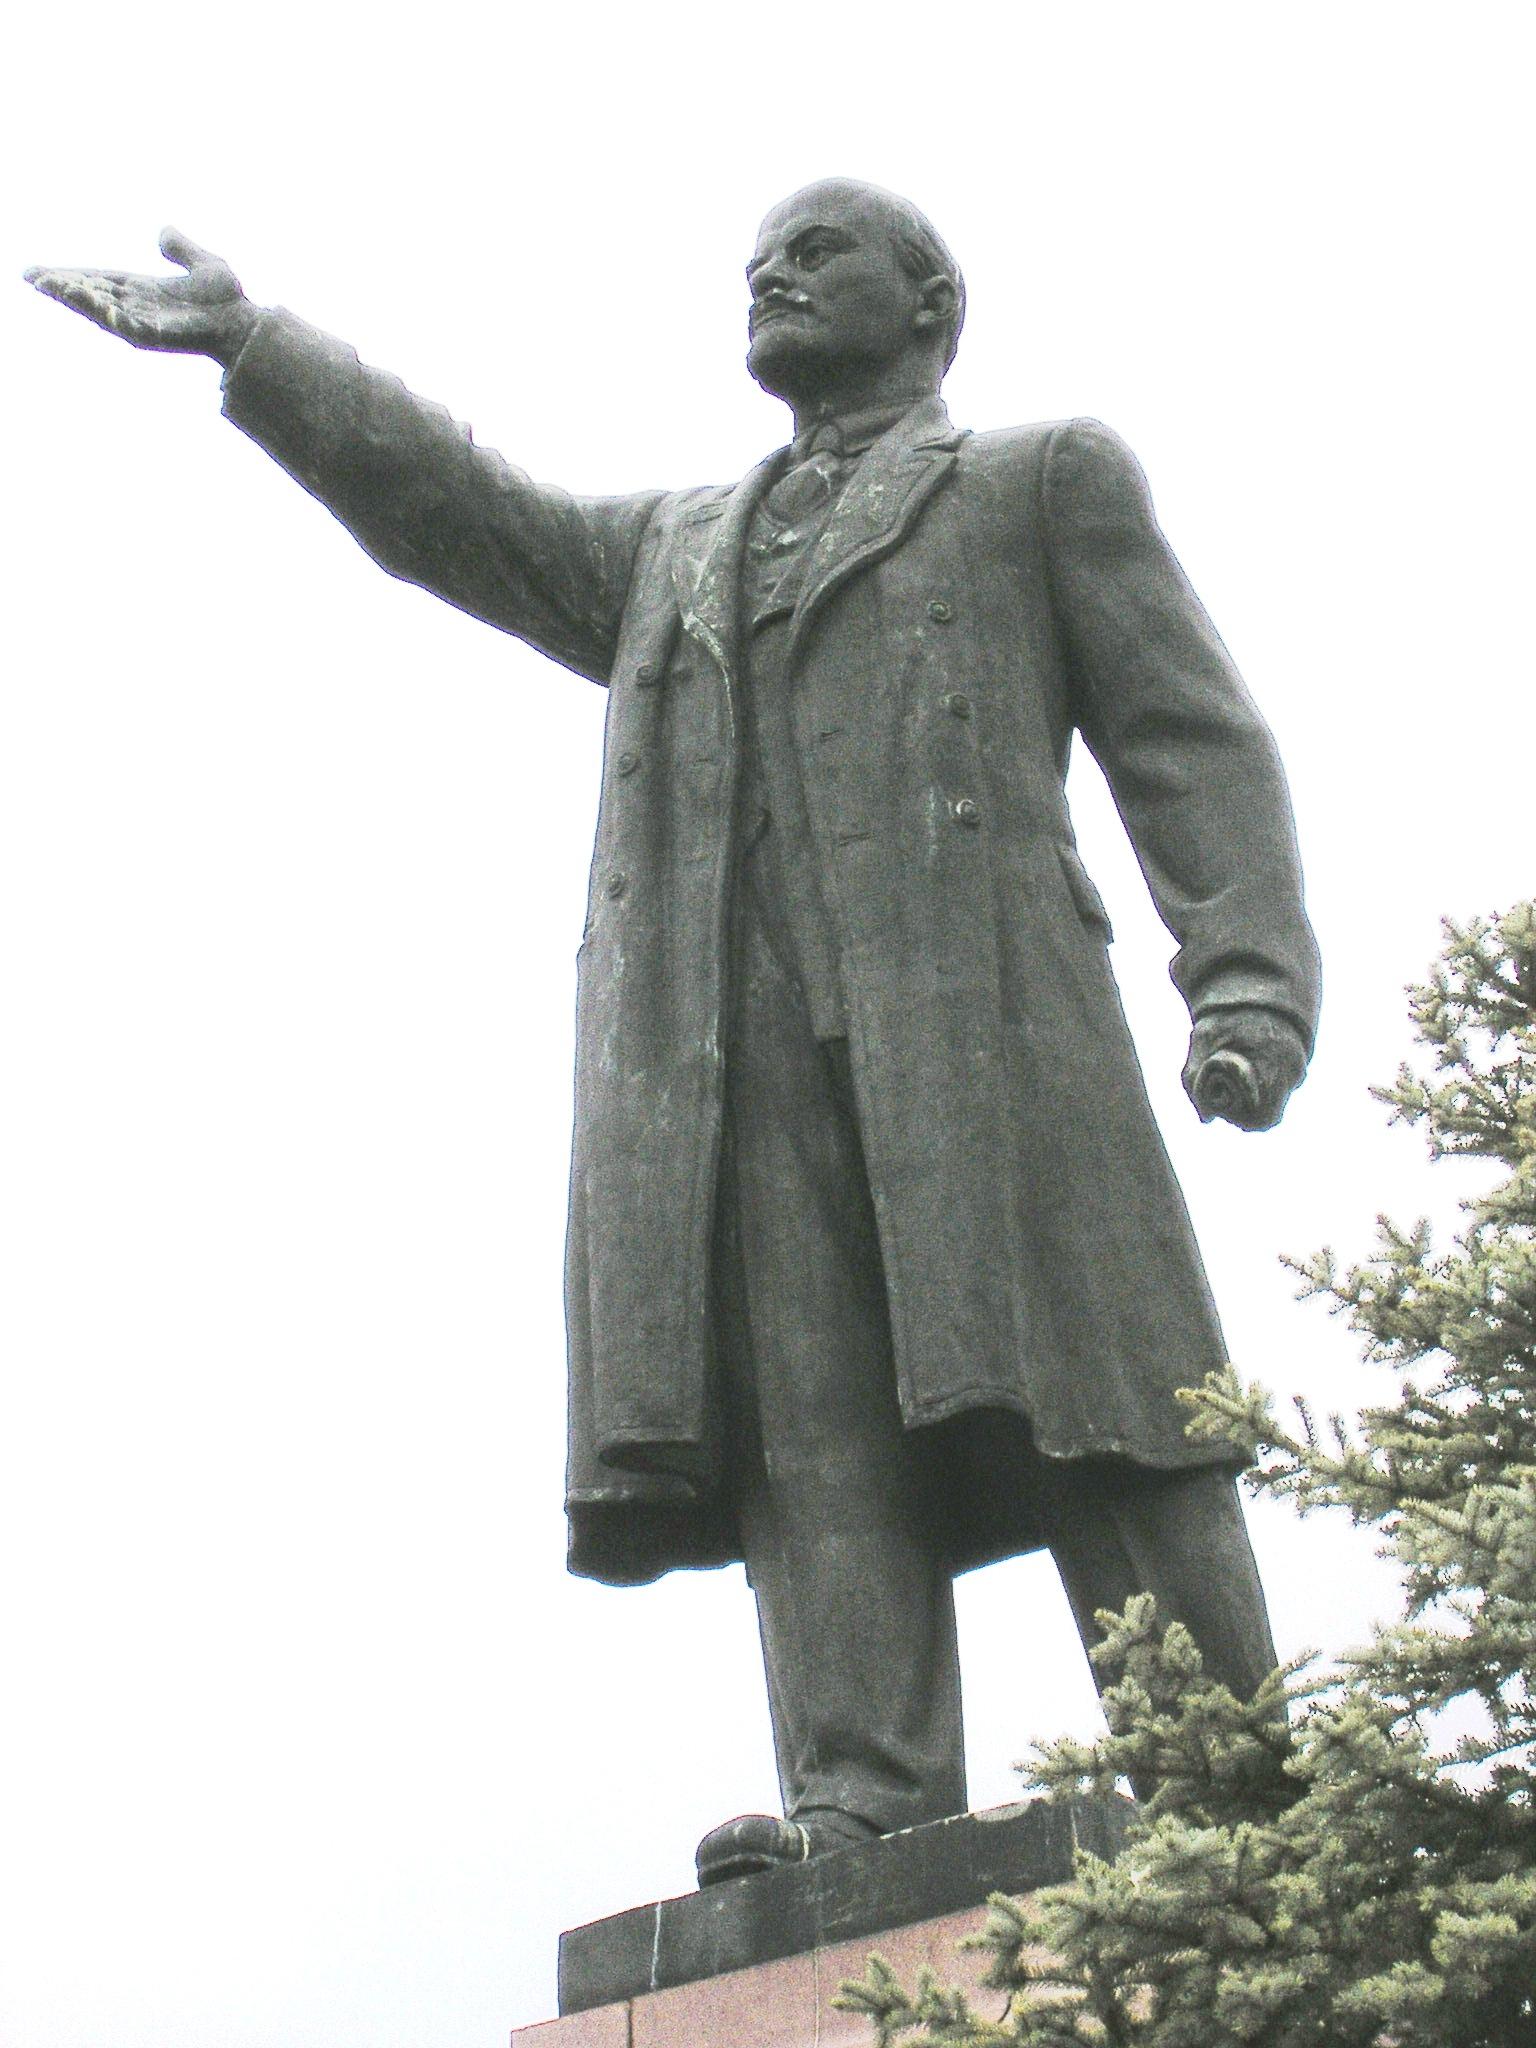 Lenin_statue_in_Kineshma,_next_to_the_Volga,_close-up_view.JPG